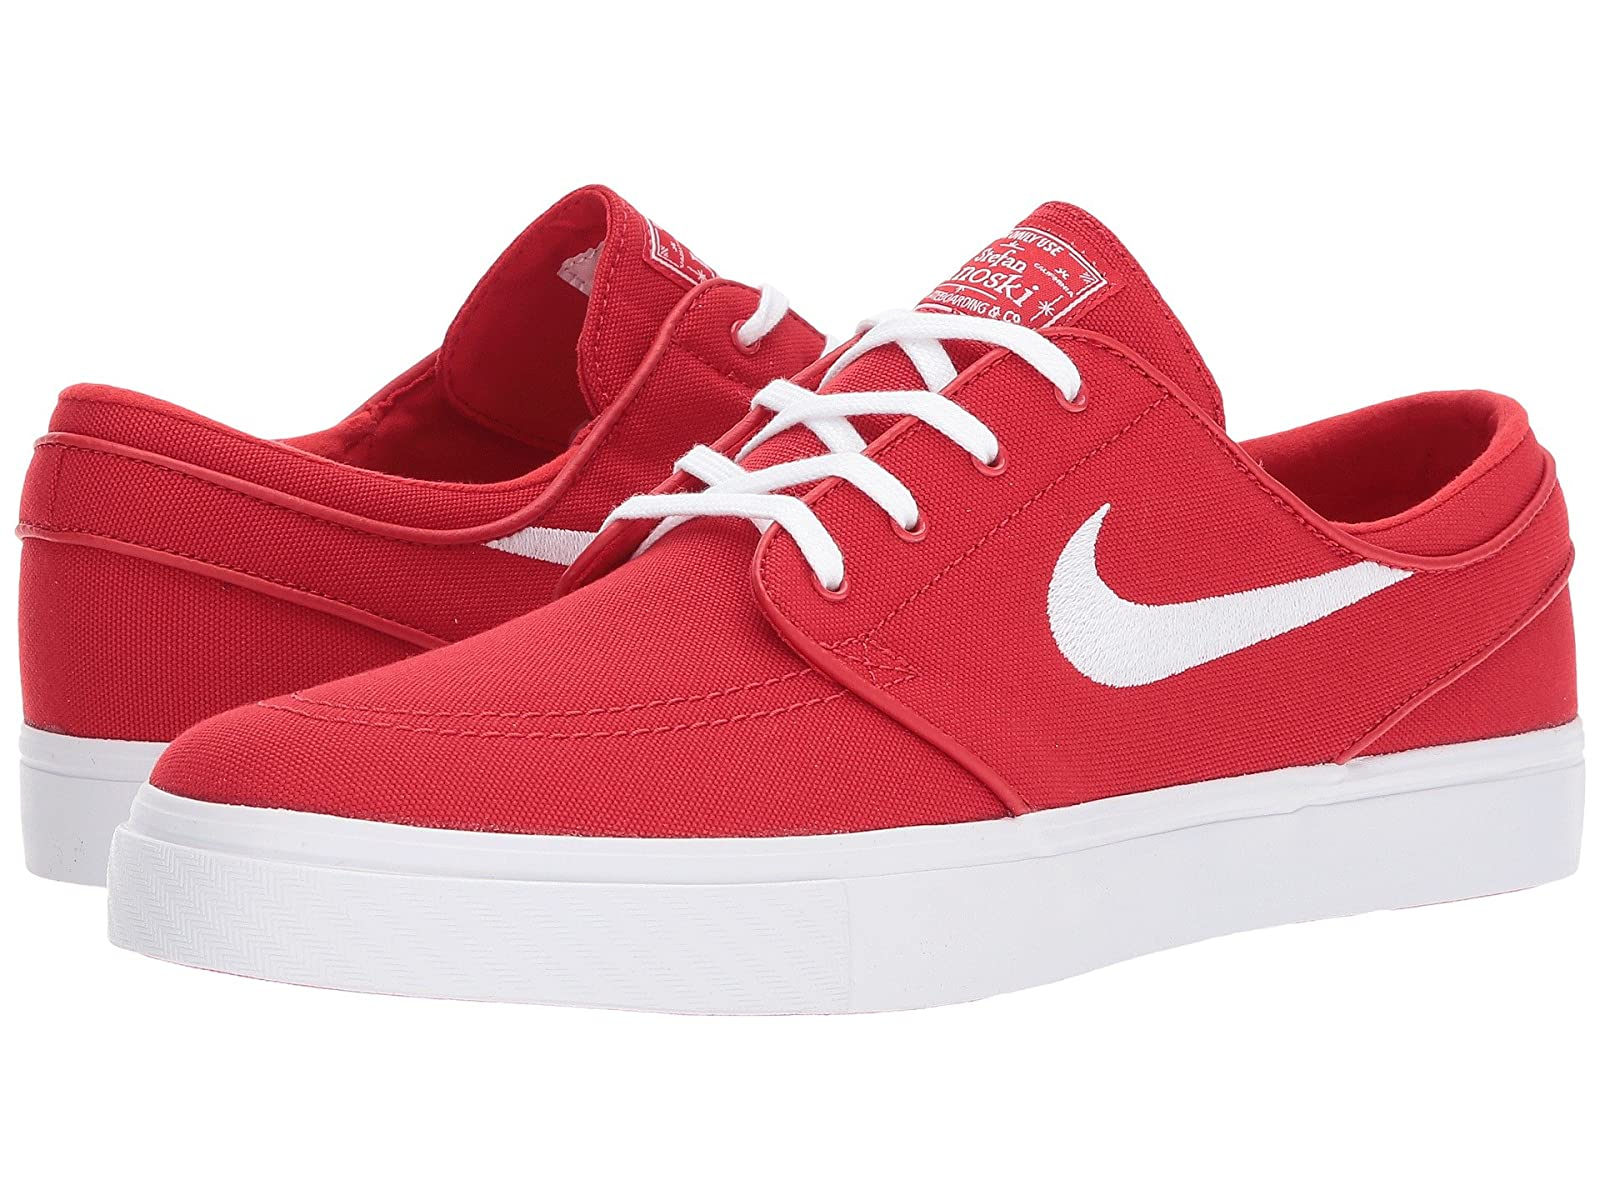 Nike SB Zoom Stefan Janoski CanvasCheap and distinctive eye-catching shoes